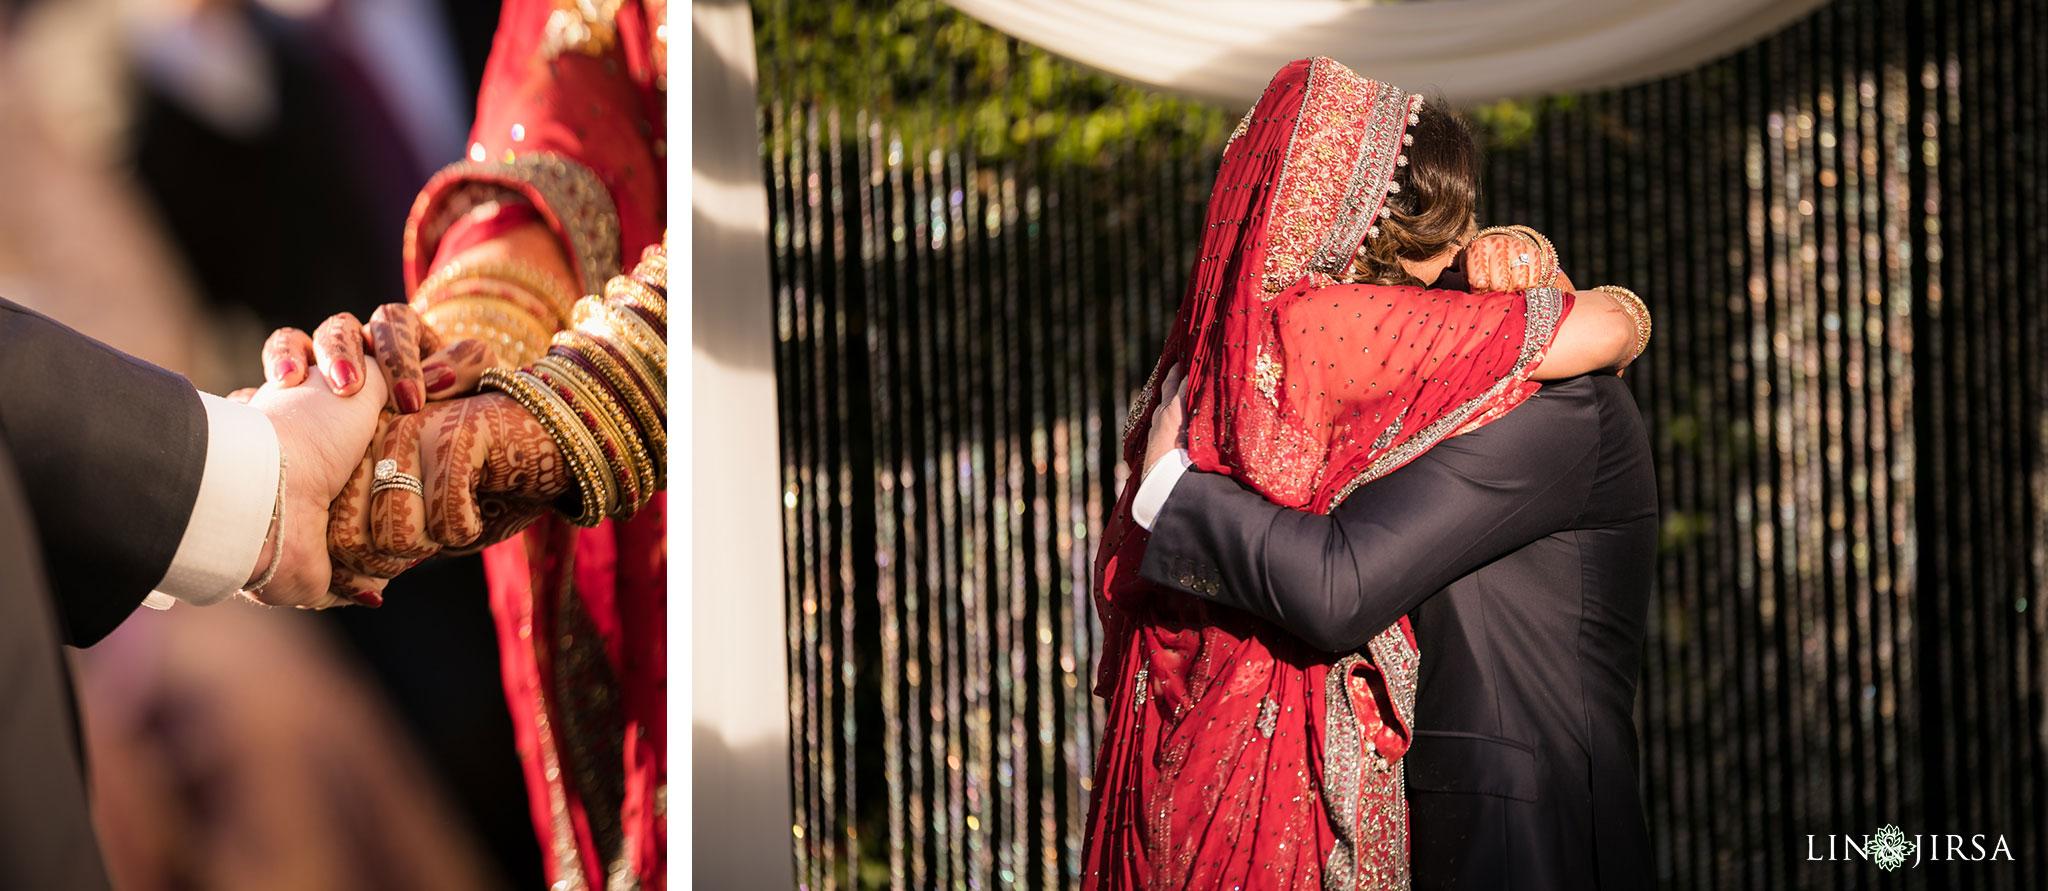 28 altadena town country club pakistani wedding ceremony photography